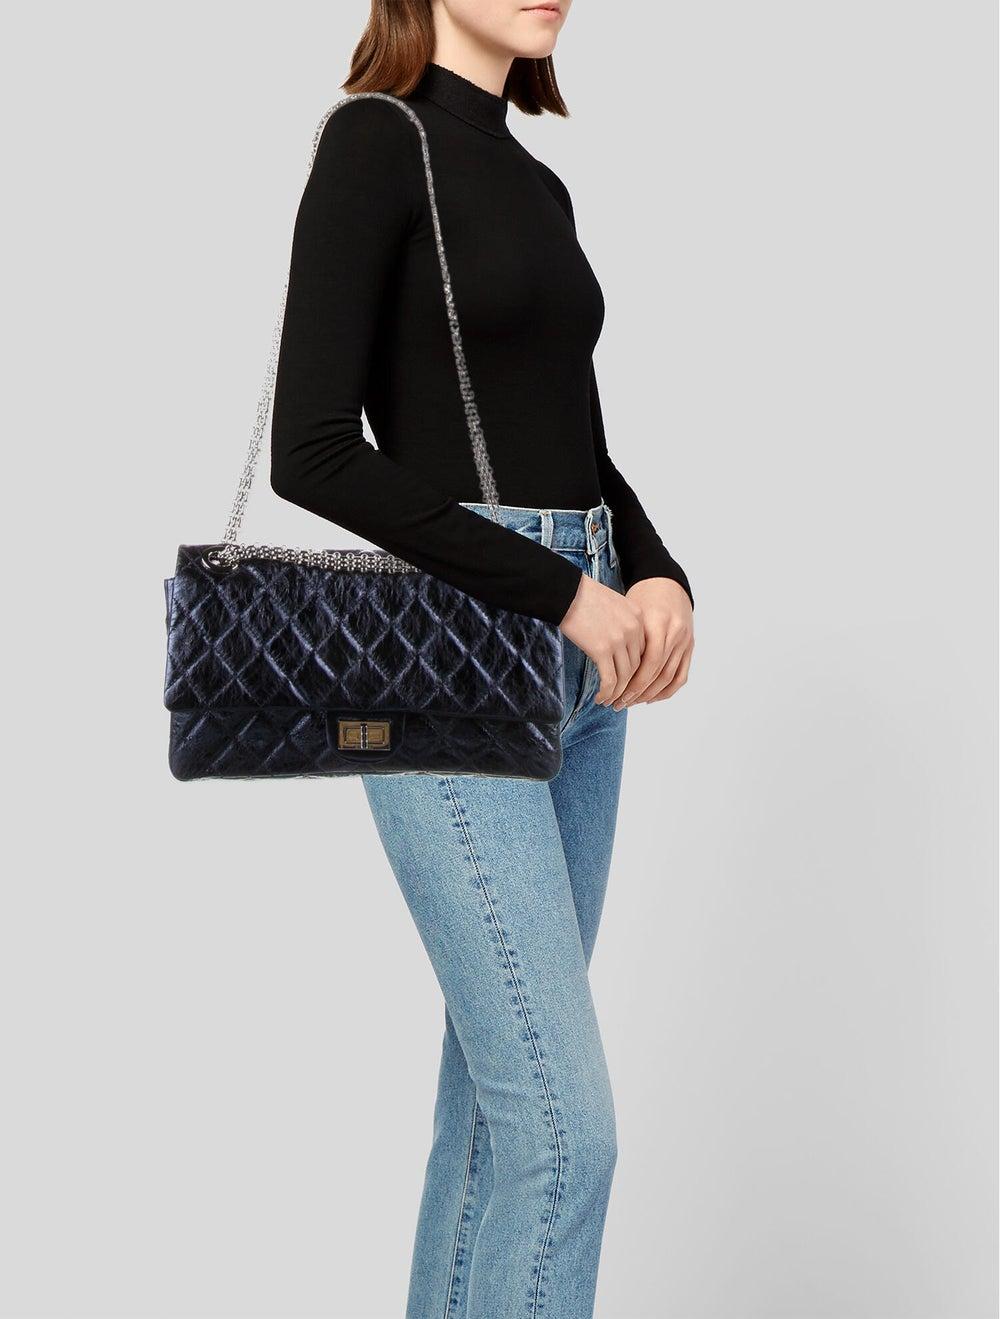 Chanel Reissue 228 Double Flap Bag Blue - image 2